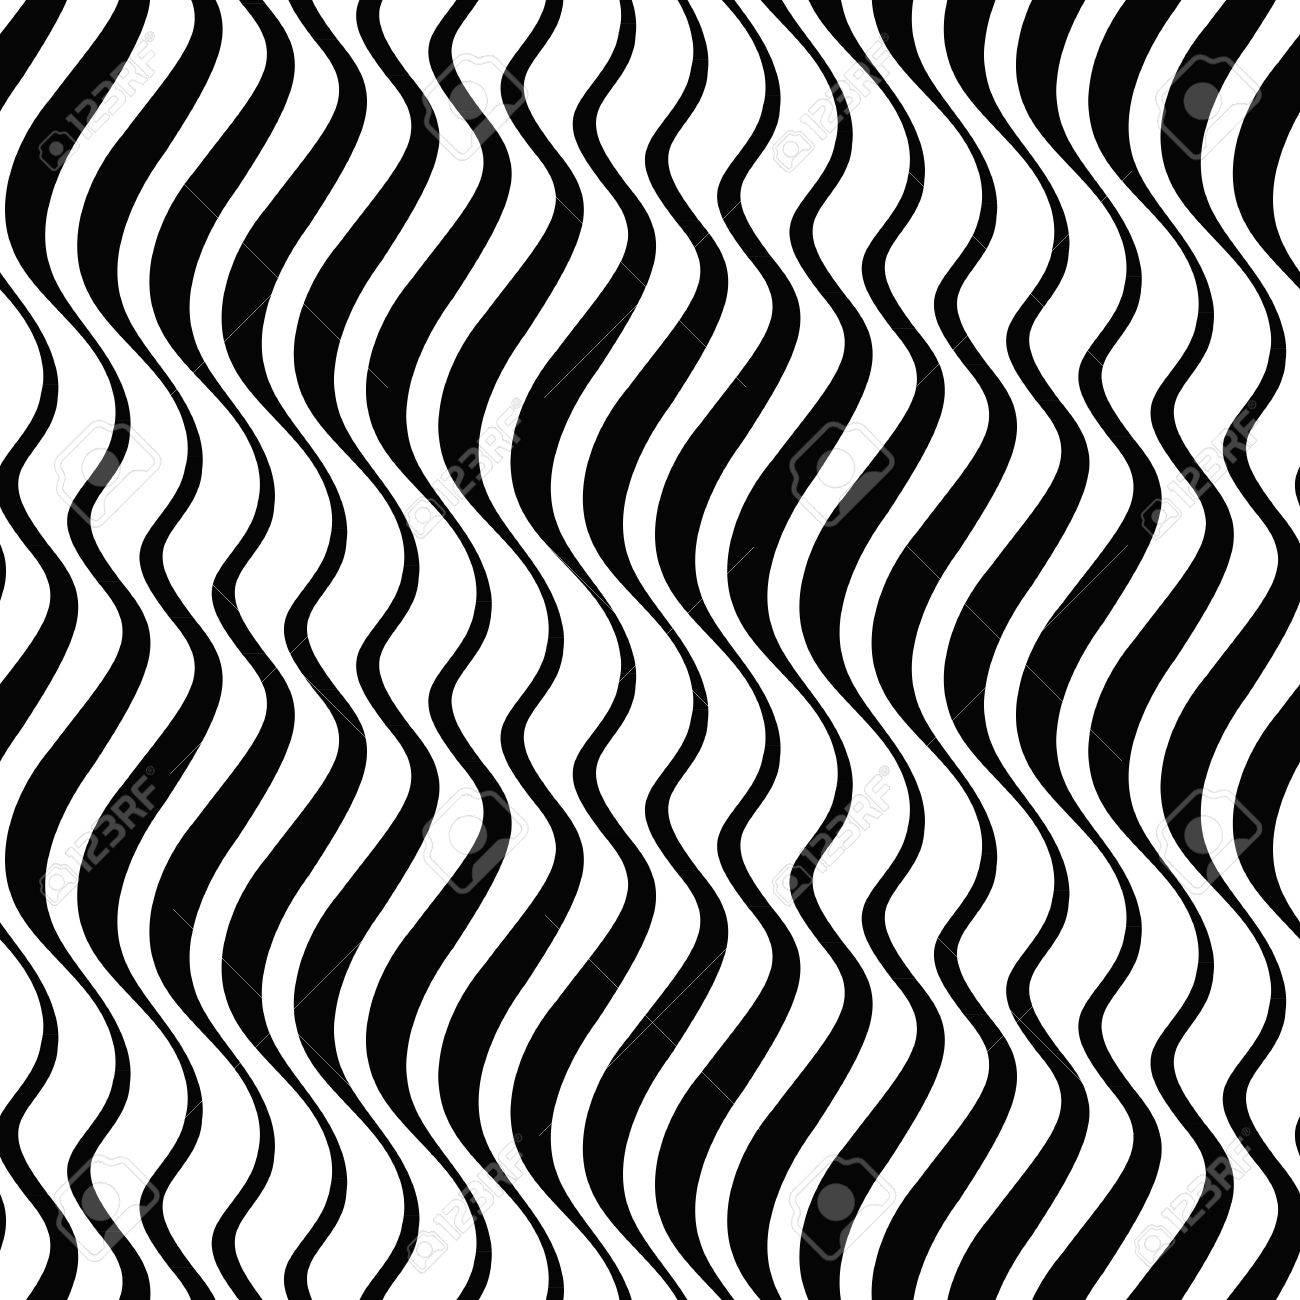 zebra abstract wave striped pattern black and white mariner rh 123rf com seamless zebra pattern vector zebra pattern vector images